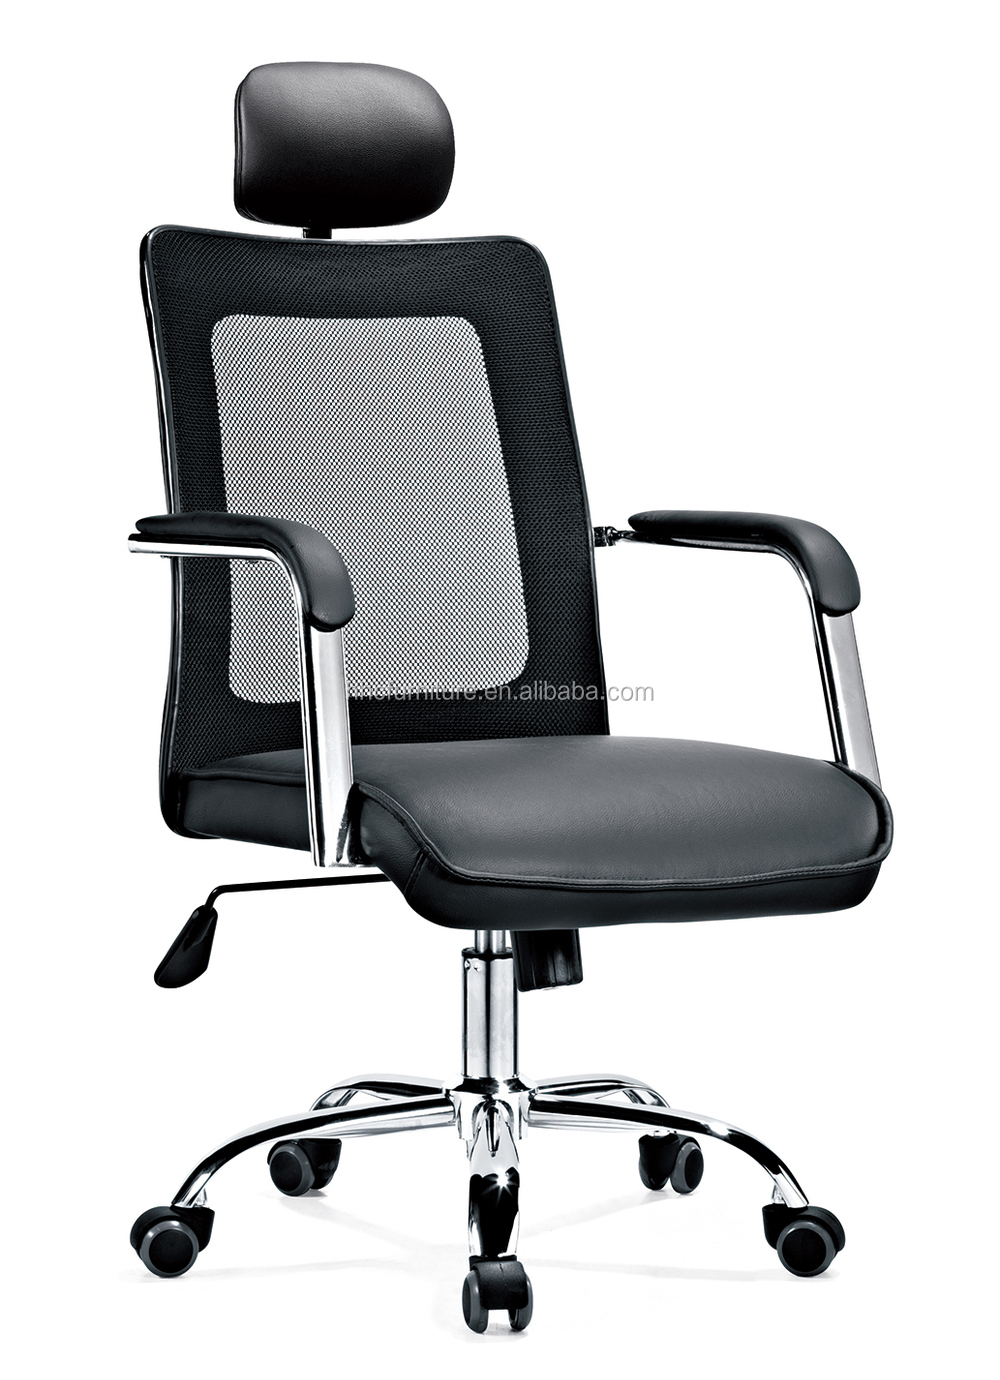 High Back Swivel Chair Ergonomic Mesh Office Chair Hc A220w Buy Ergonomic M